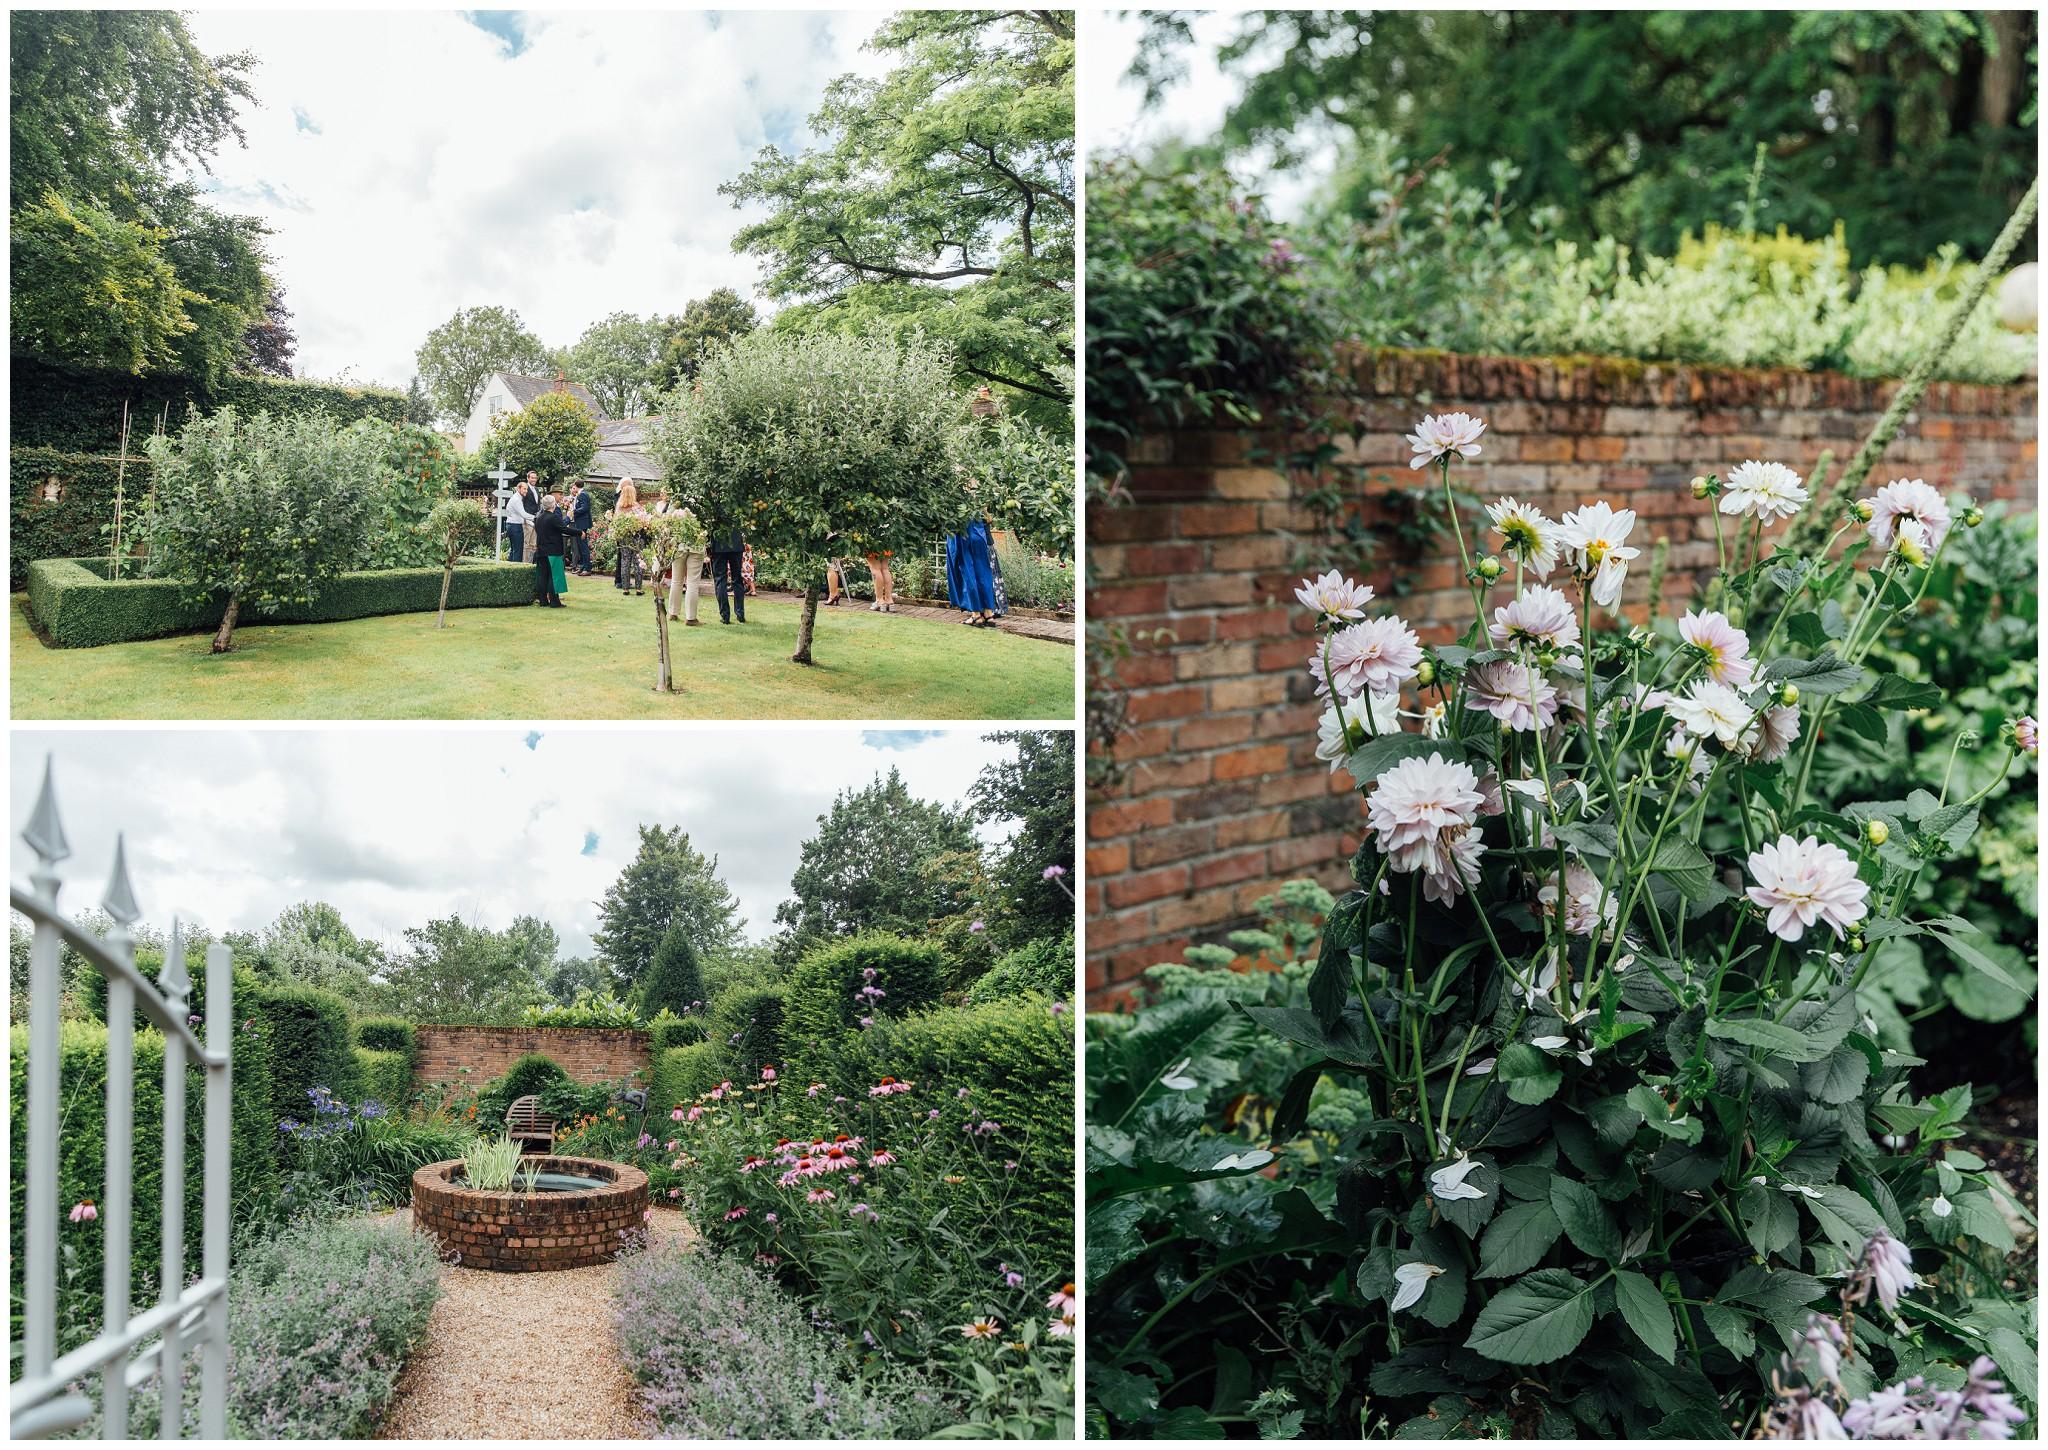 Backgarden wedding inspiration